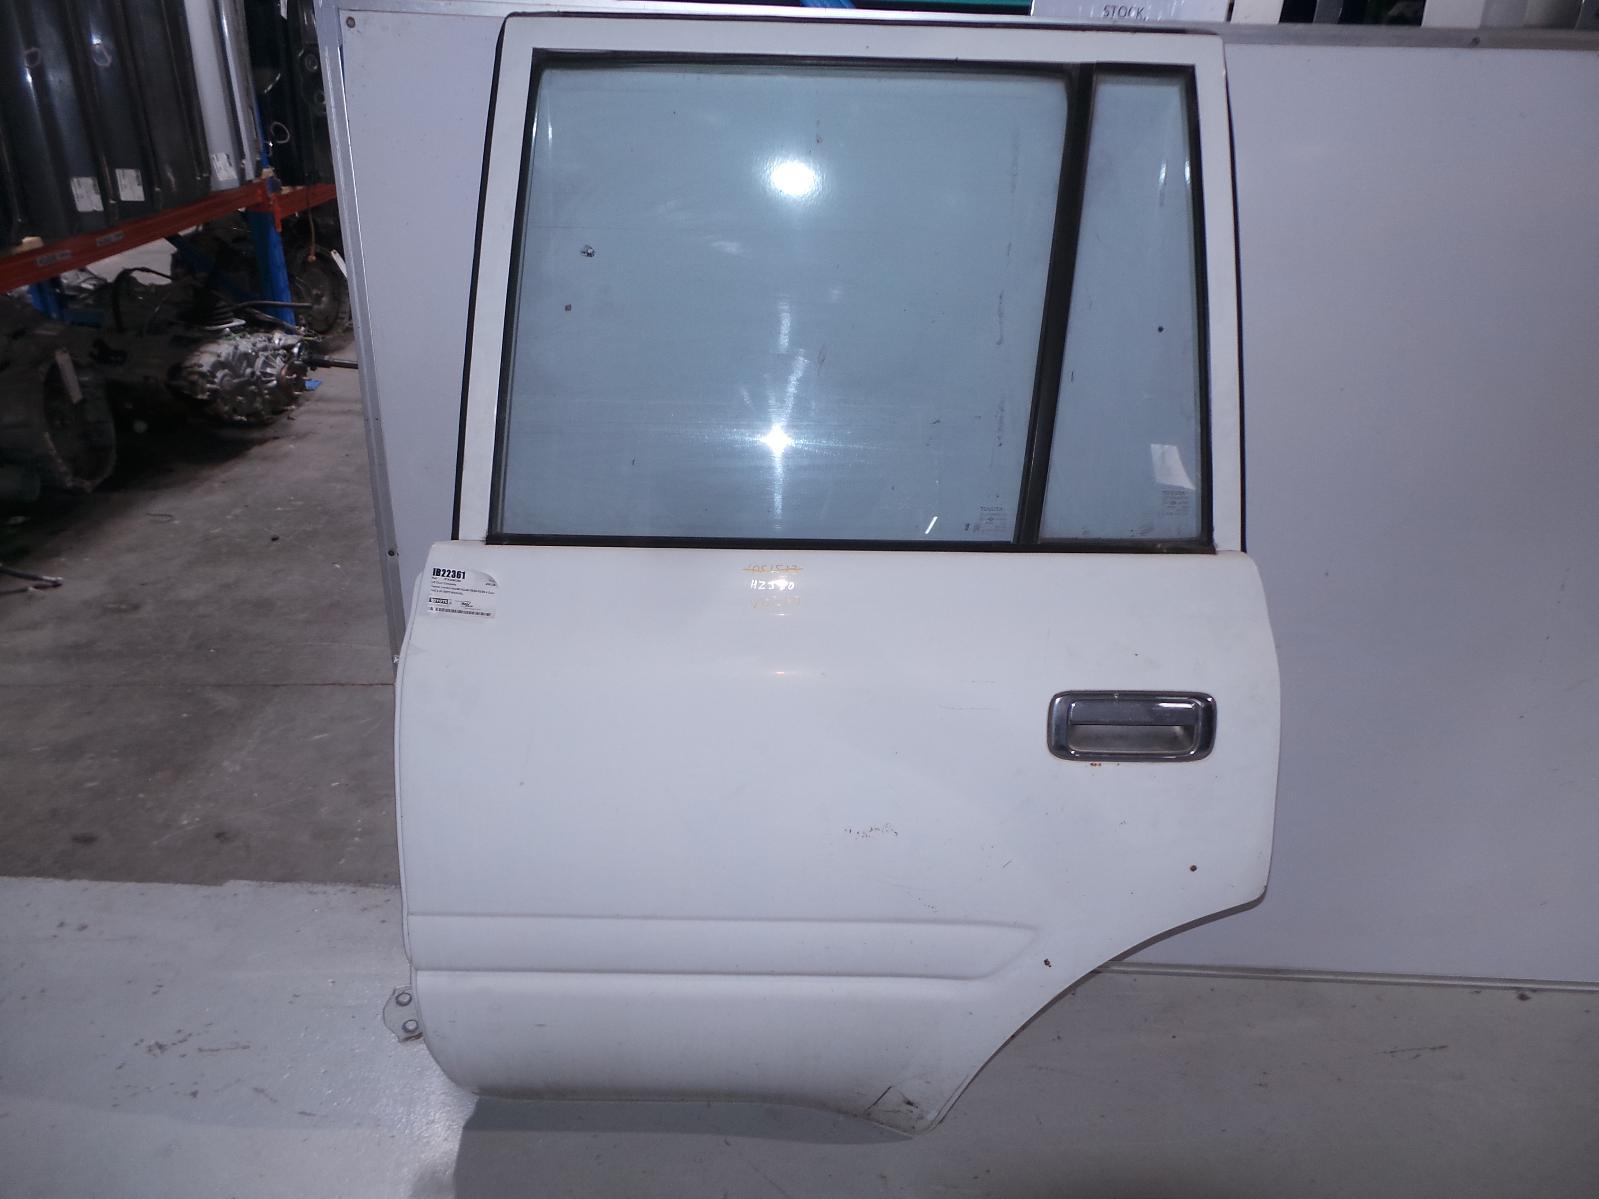 TOYOTA LANDCRUISER, Left Rear Door/Sliding, 80 SERIES, NON FLARE TYPE, 05/90-03/98